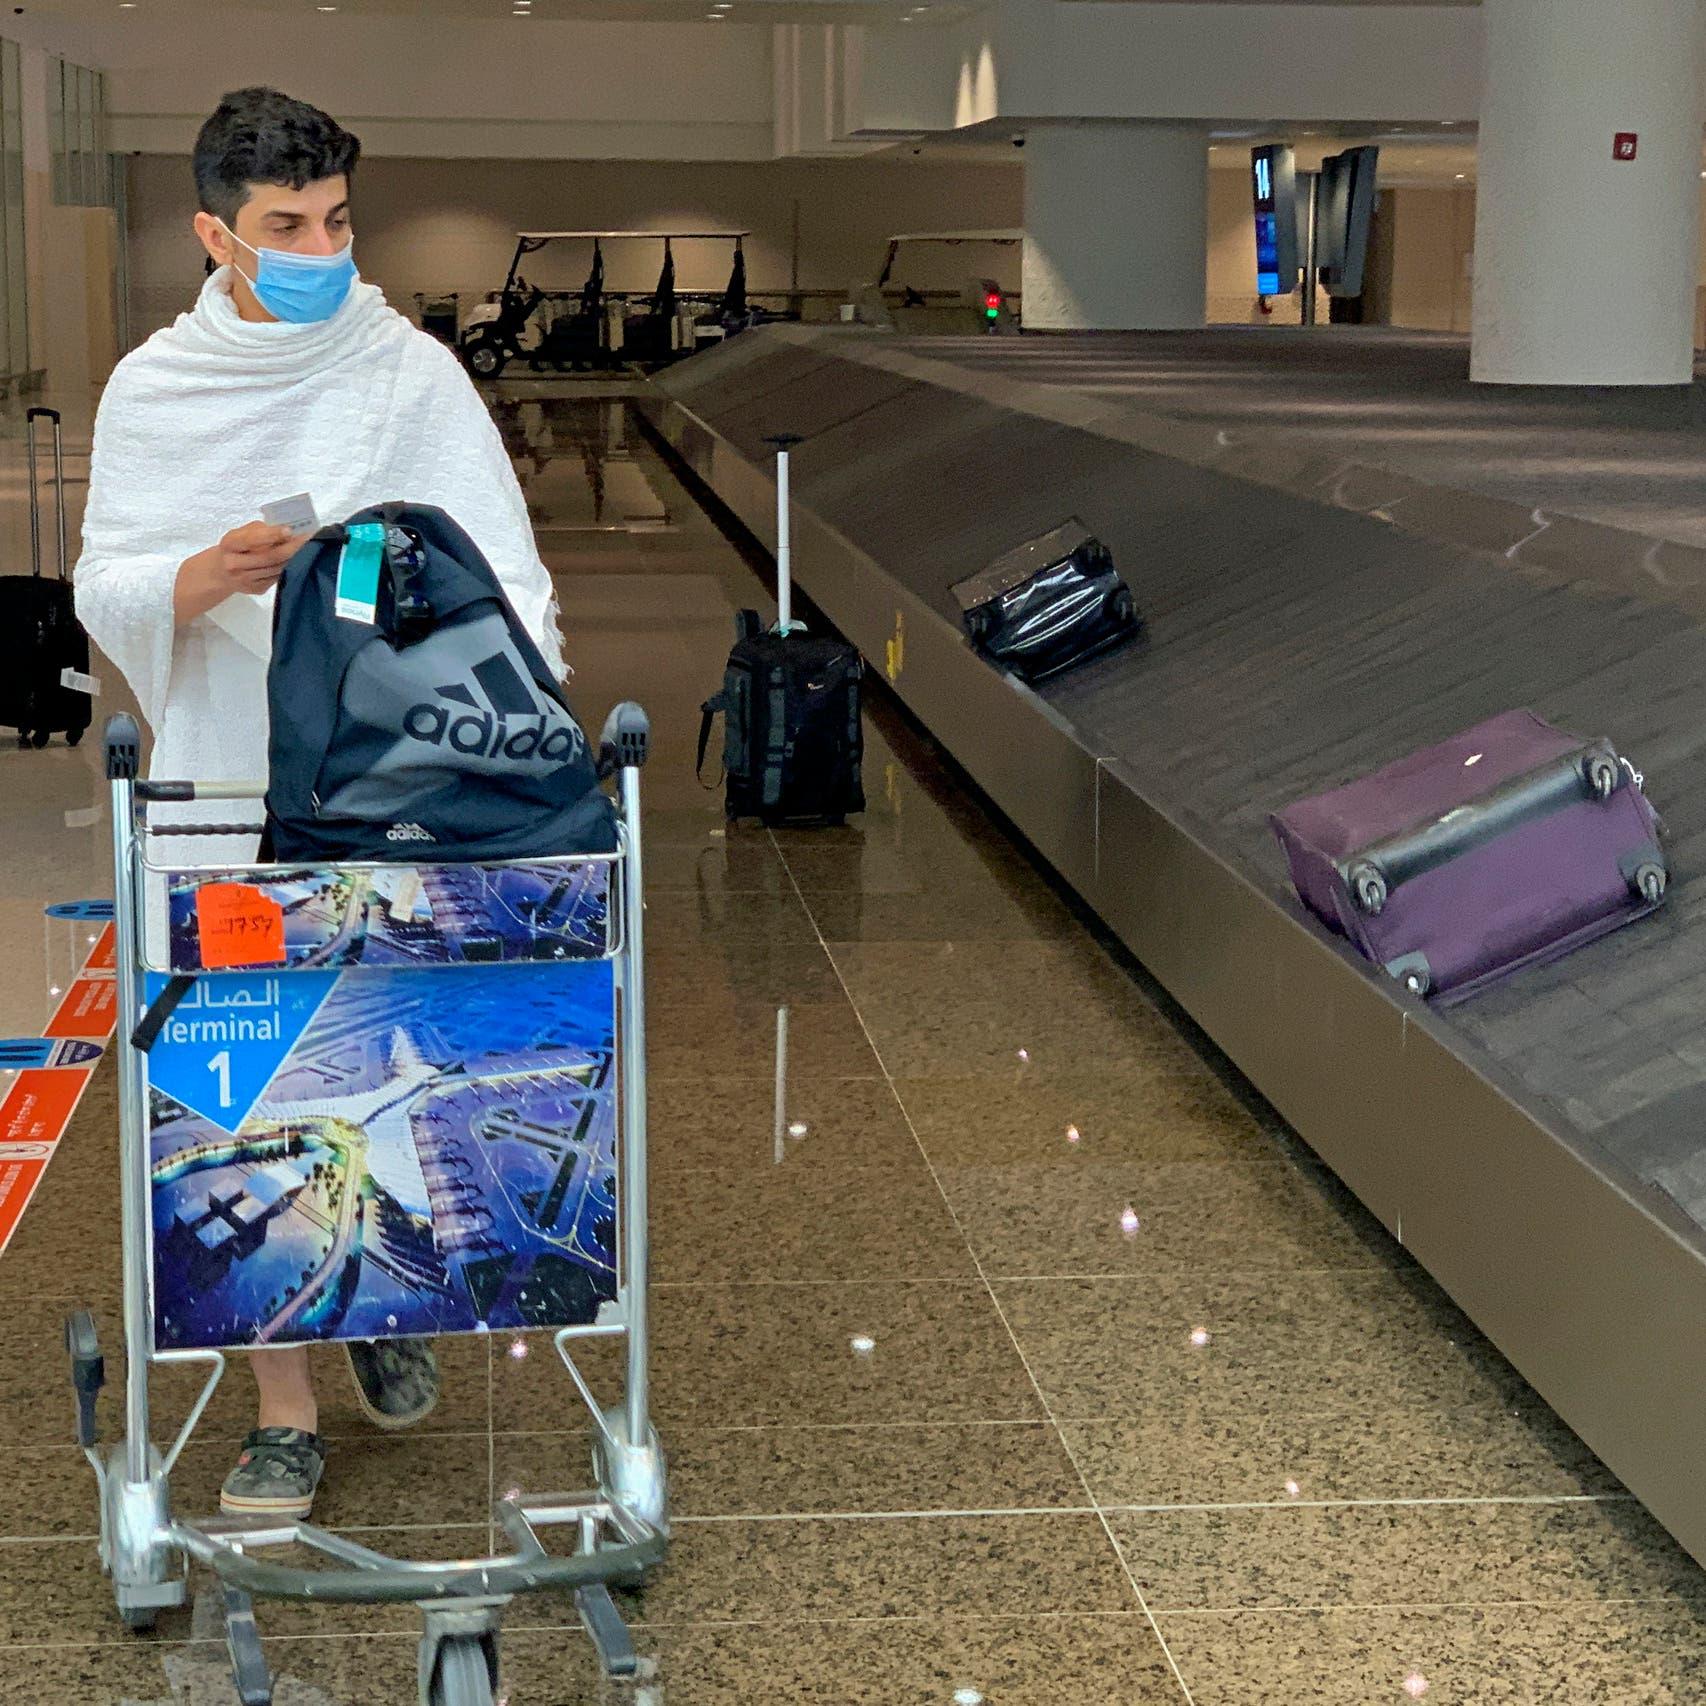 Ahead of Hajj, pilgrims around Saudi Arabia make their way to Jeddah